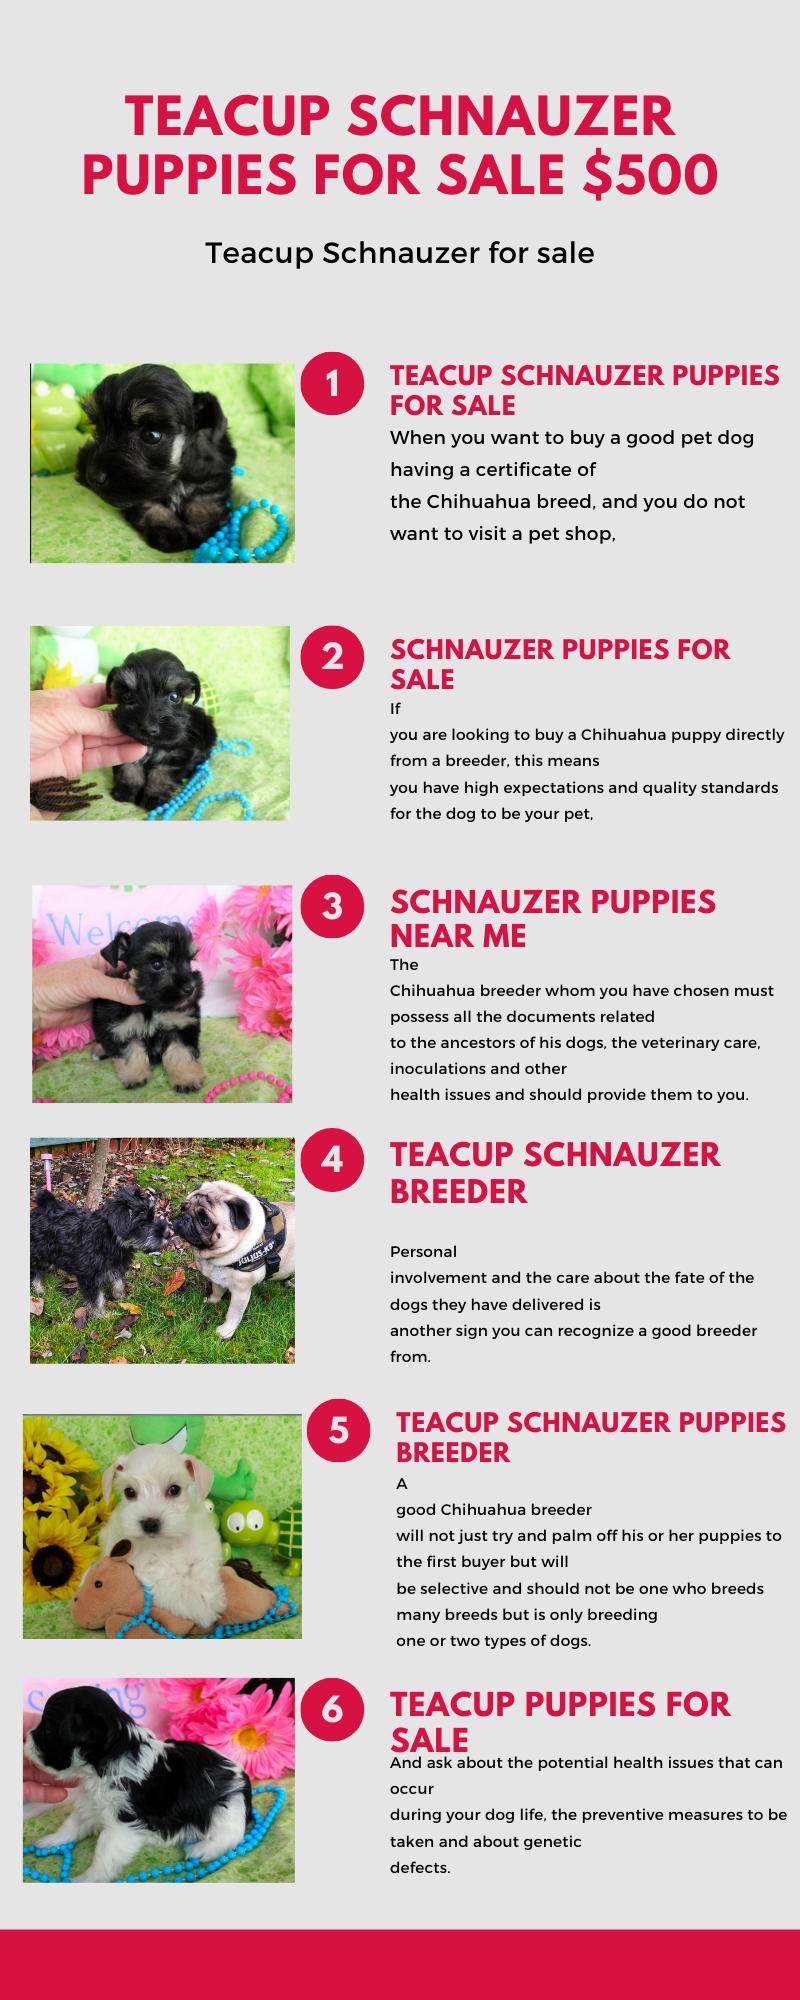 Schnauzer puppies near me